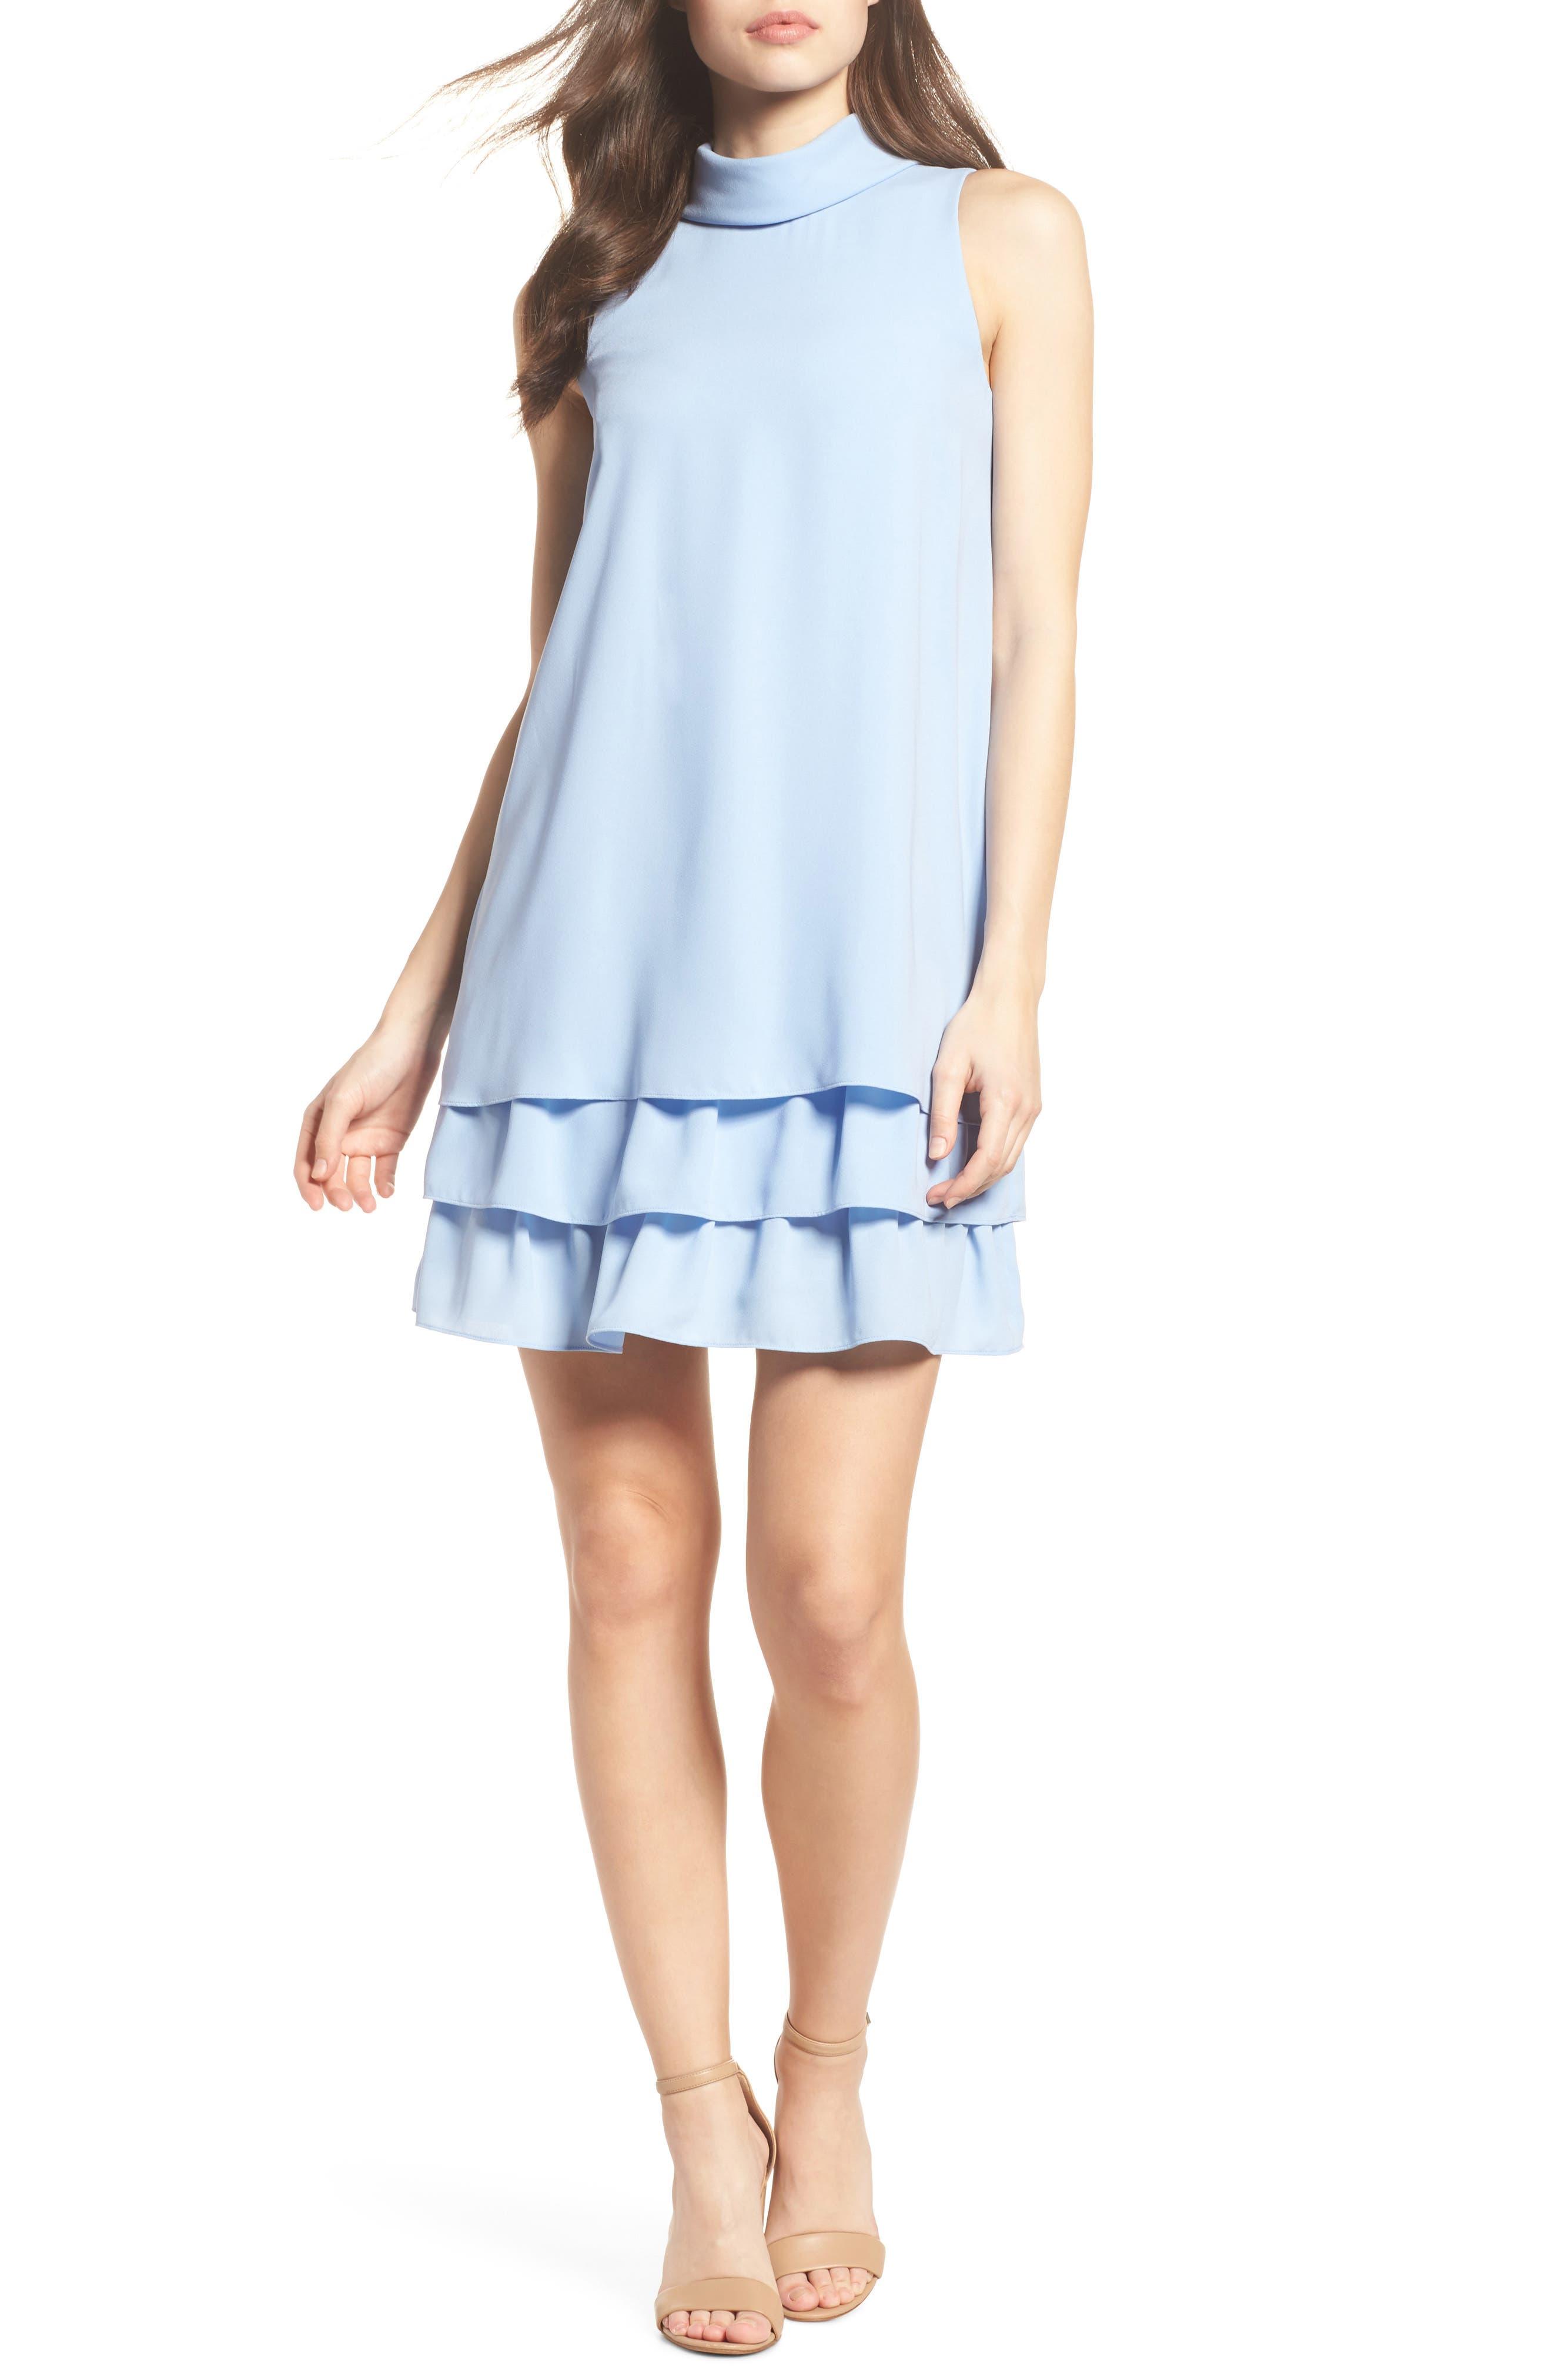 Moss Crepe Roll Neck Ruffle Dress,                         Main,                         color, Light Blue